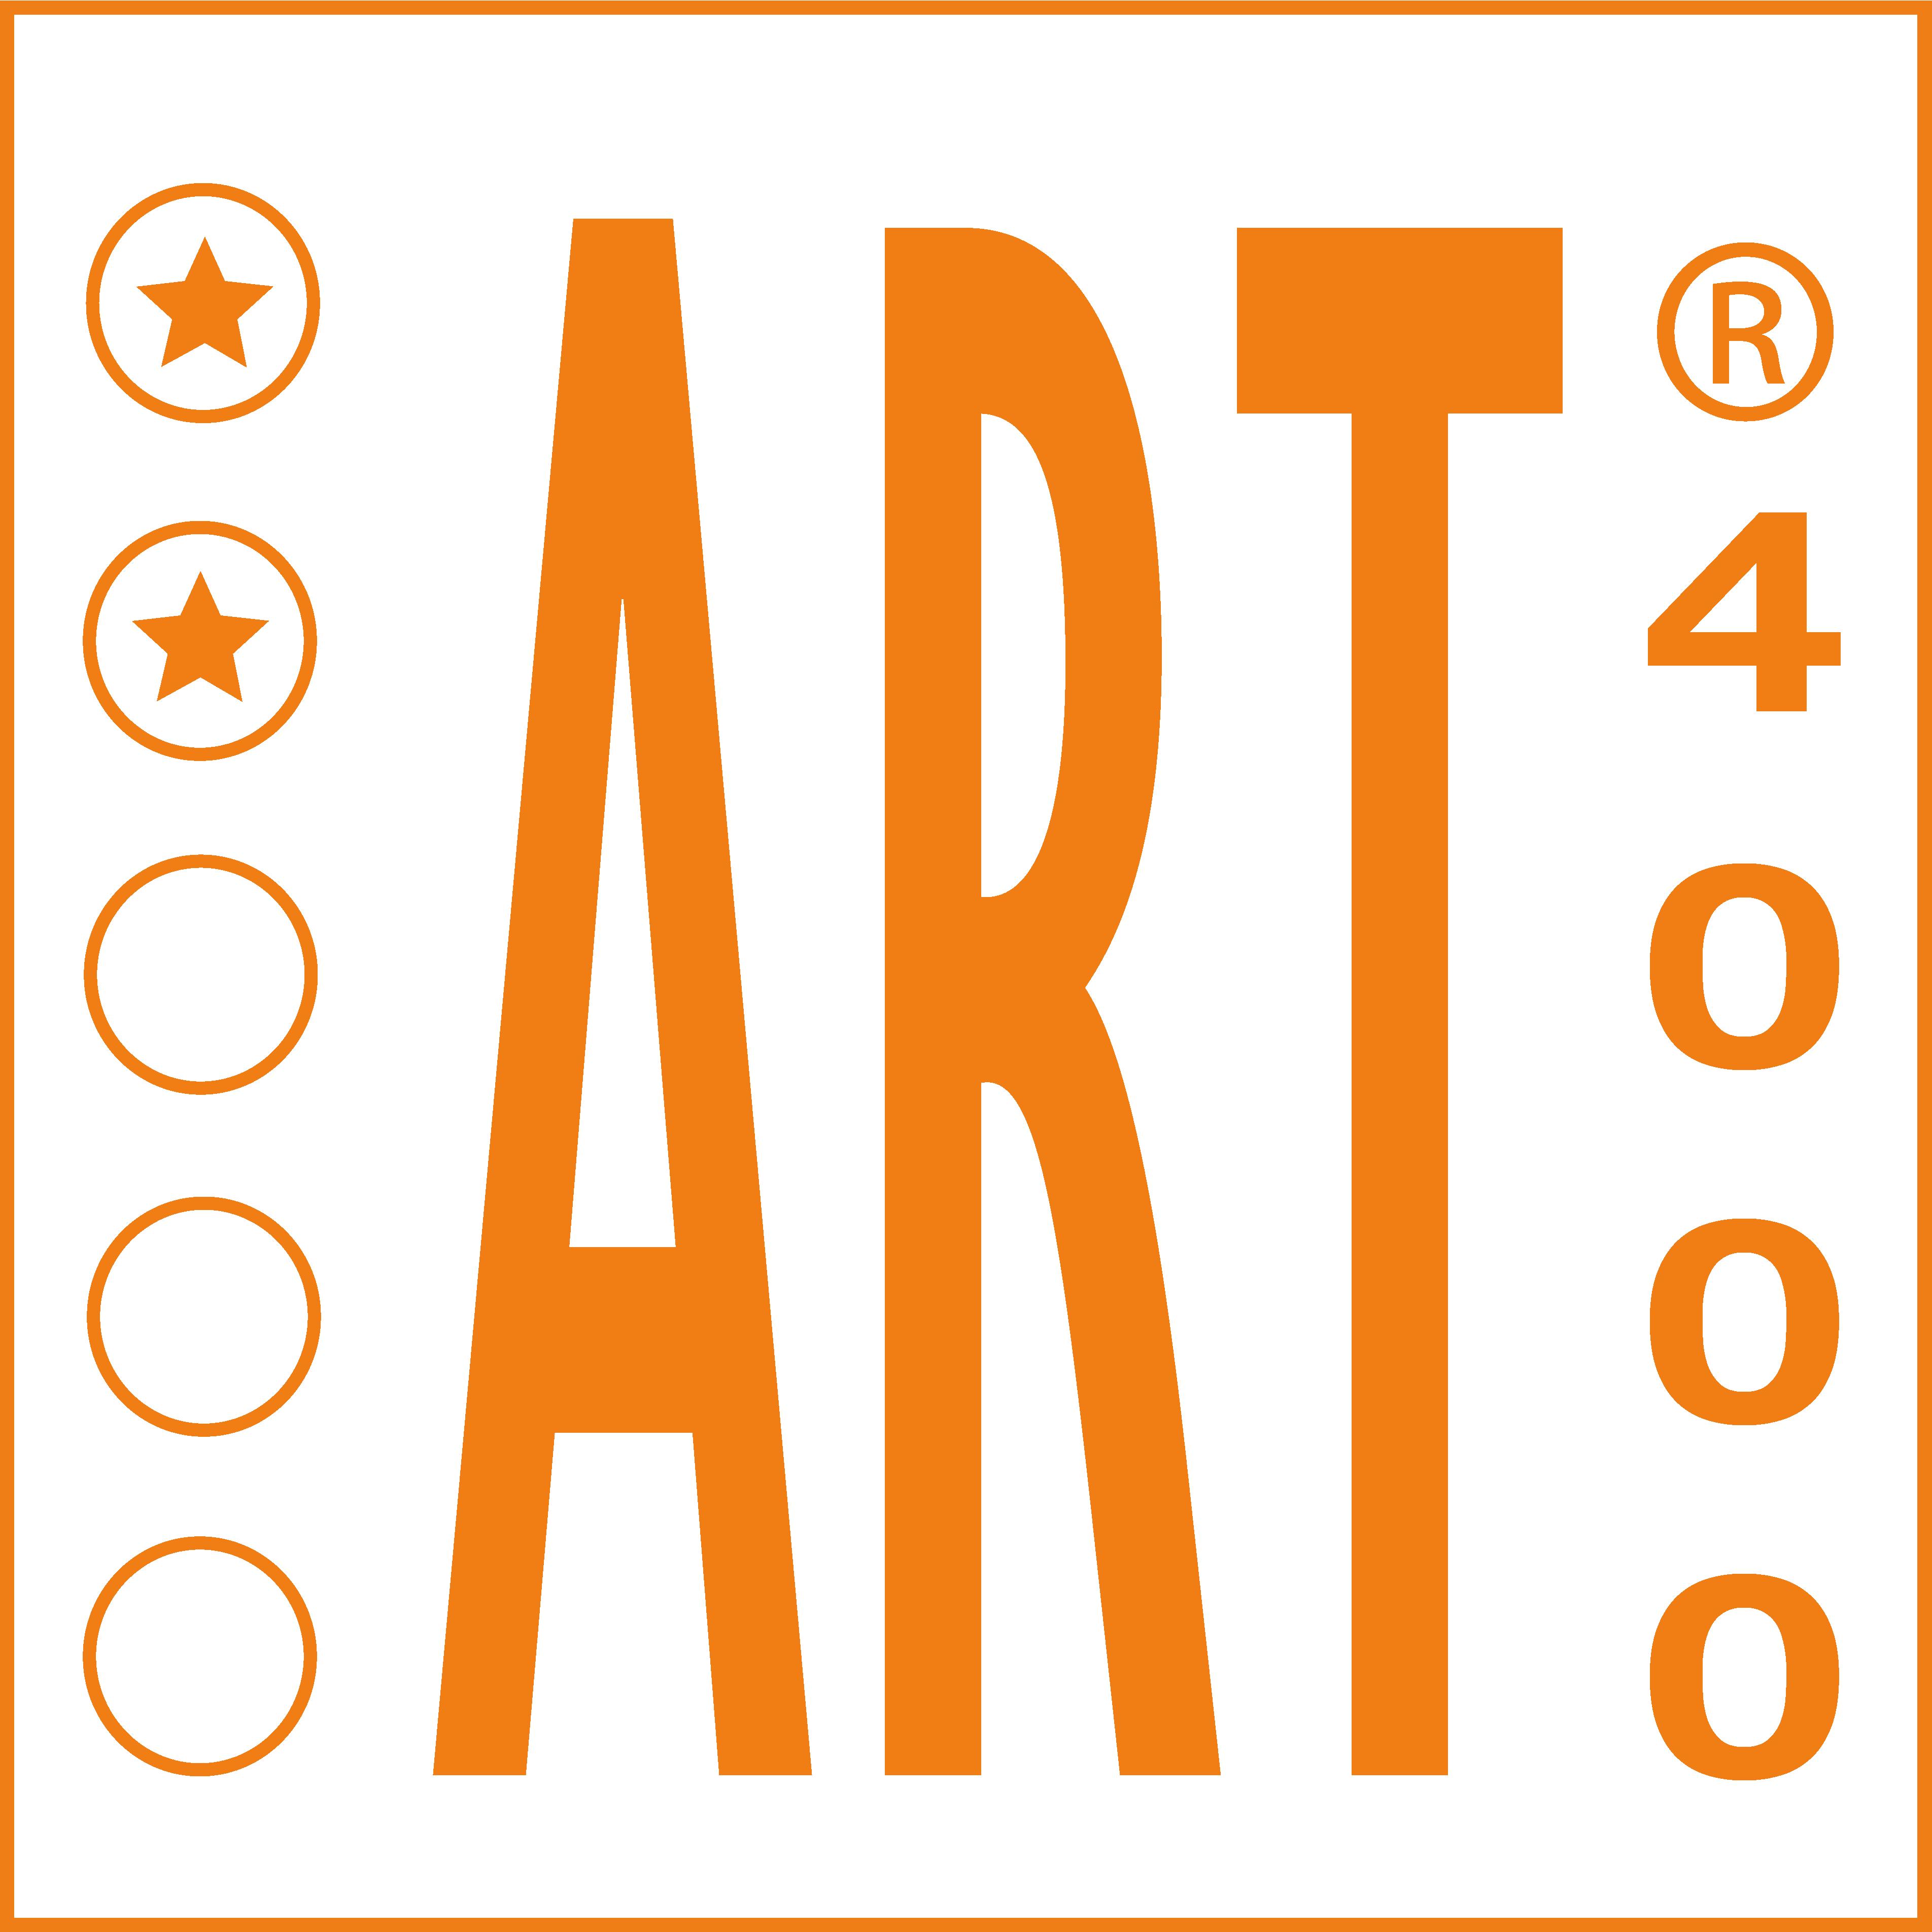 AXA Cherto Compact ART 2 - 95cm